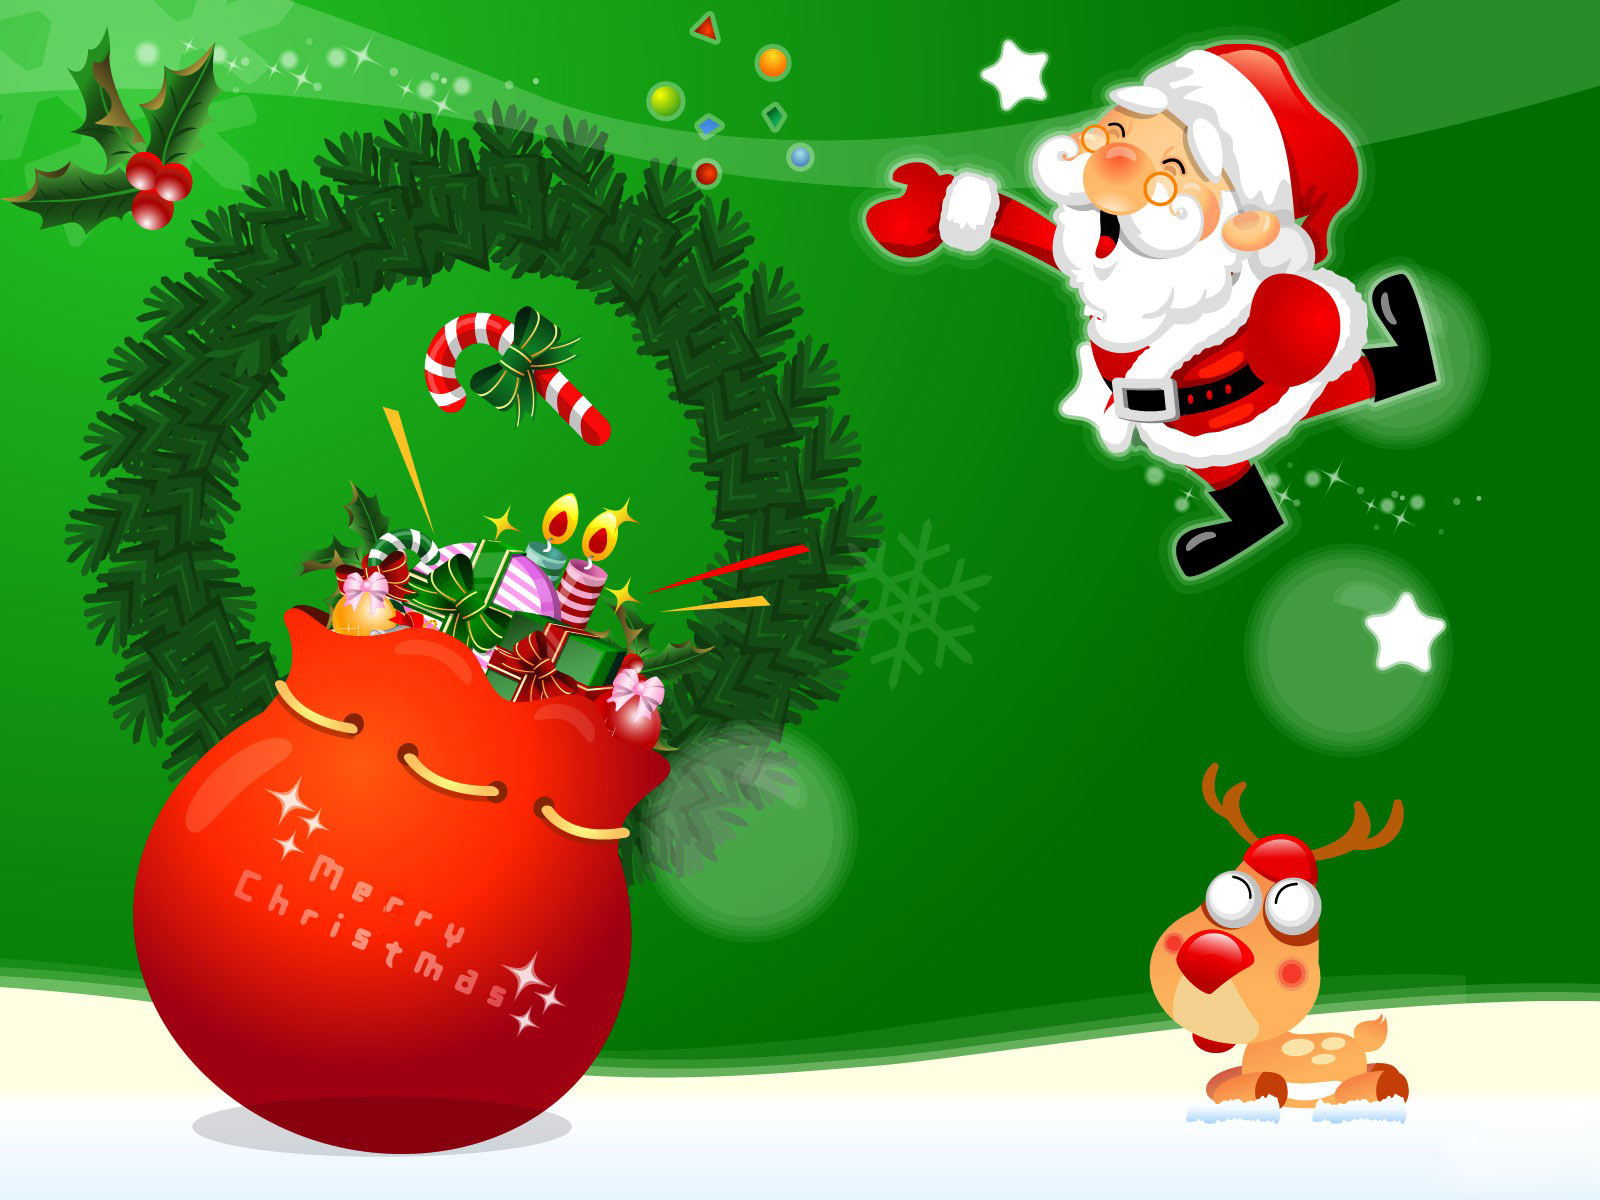 Holiday Wallpaper For Ipad: Free IPad Retina HD Wallpapers